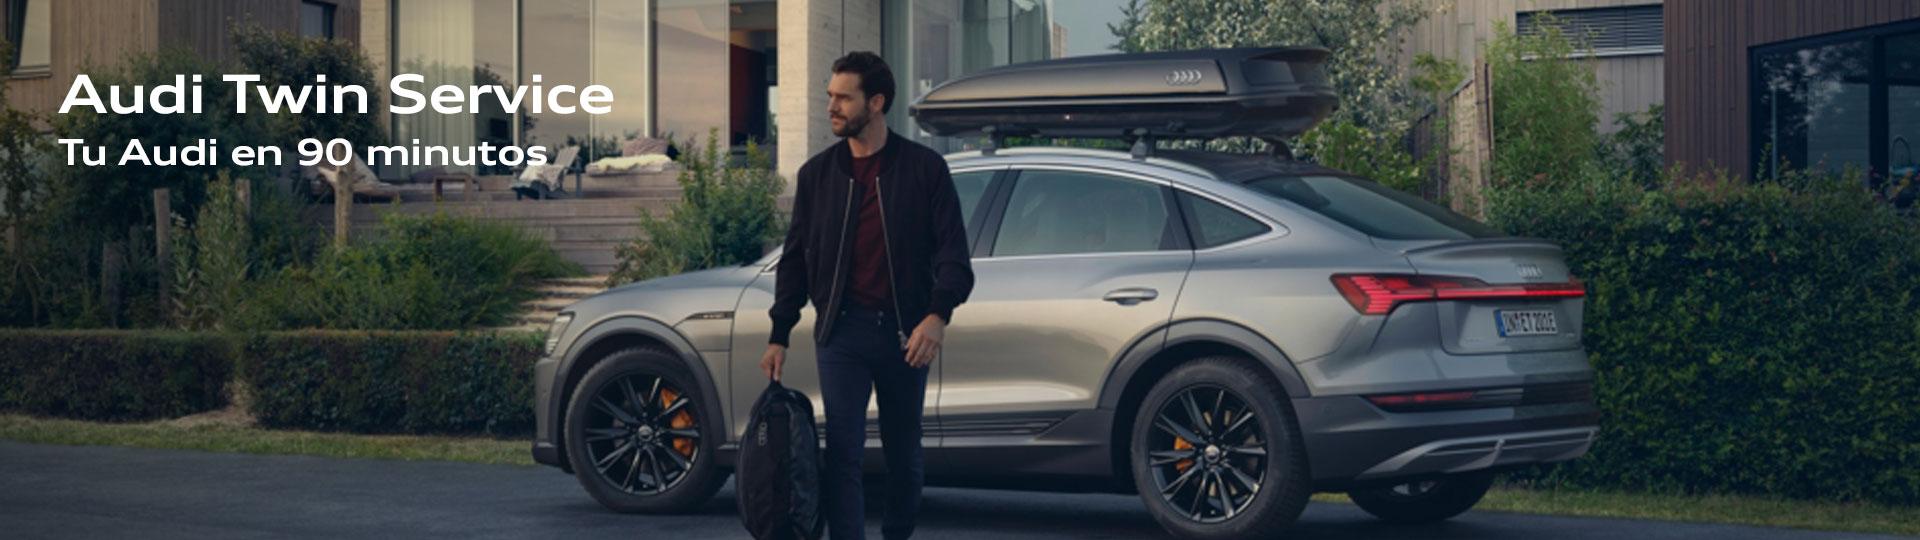 Cabecera-Audi-Twin-Service